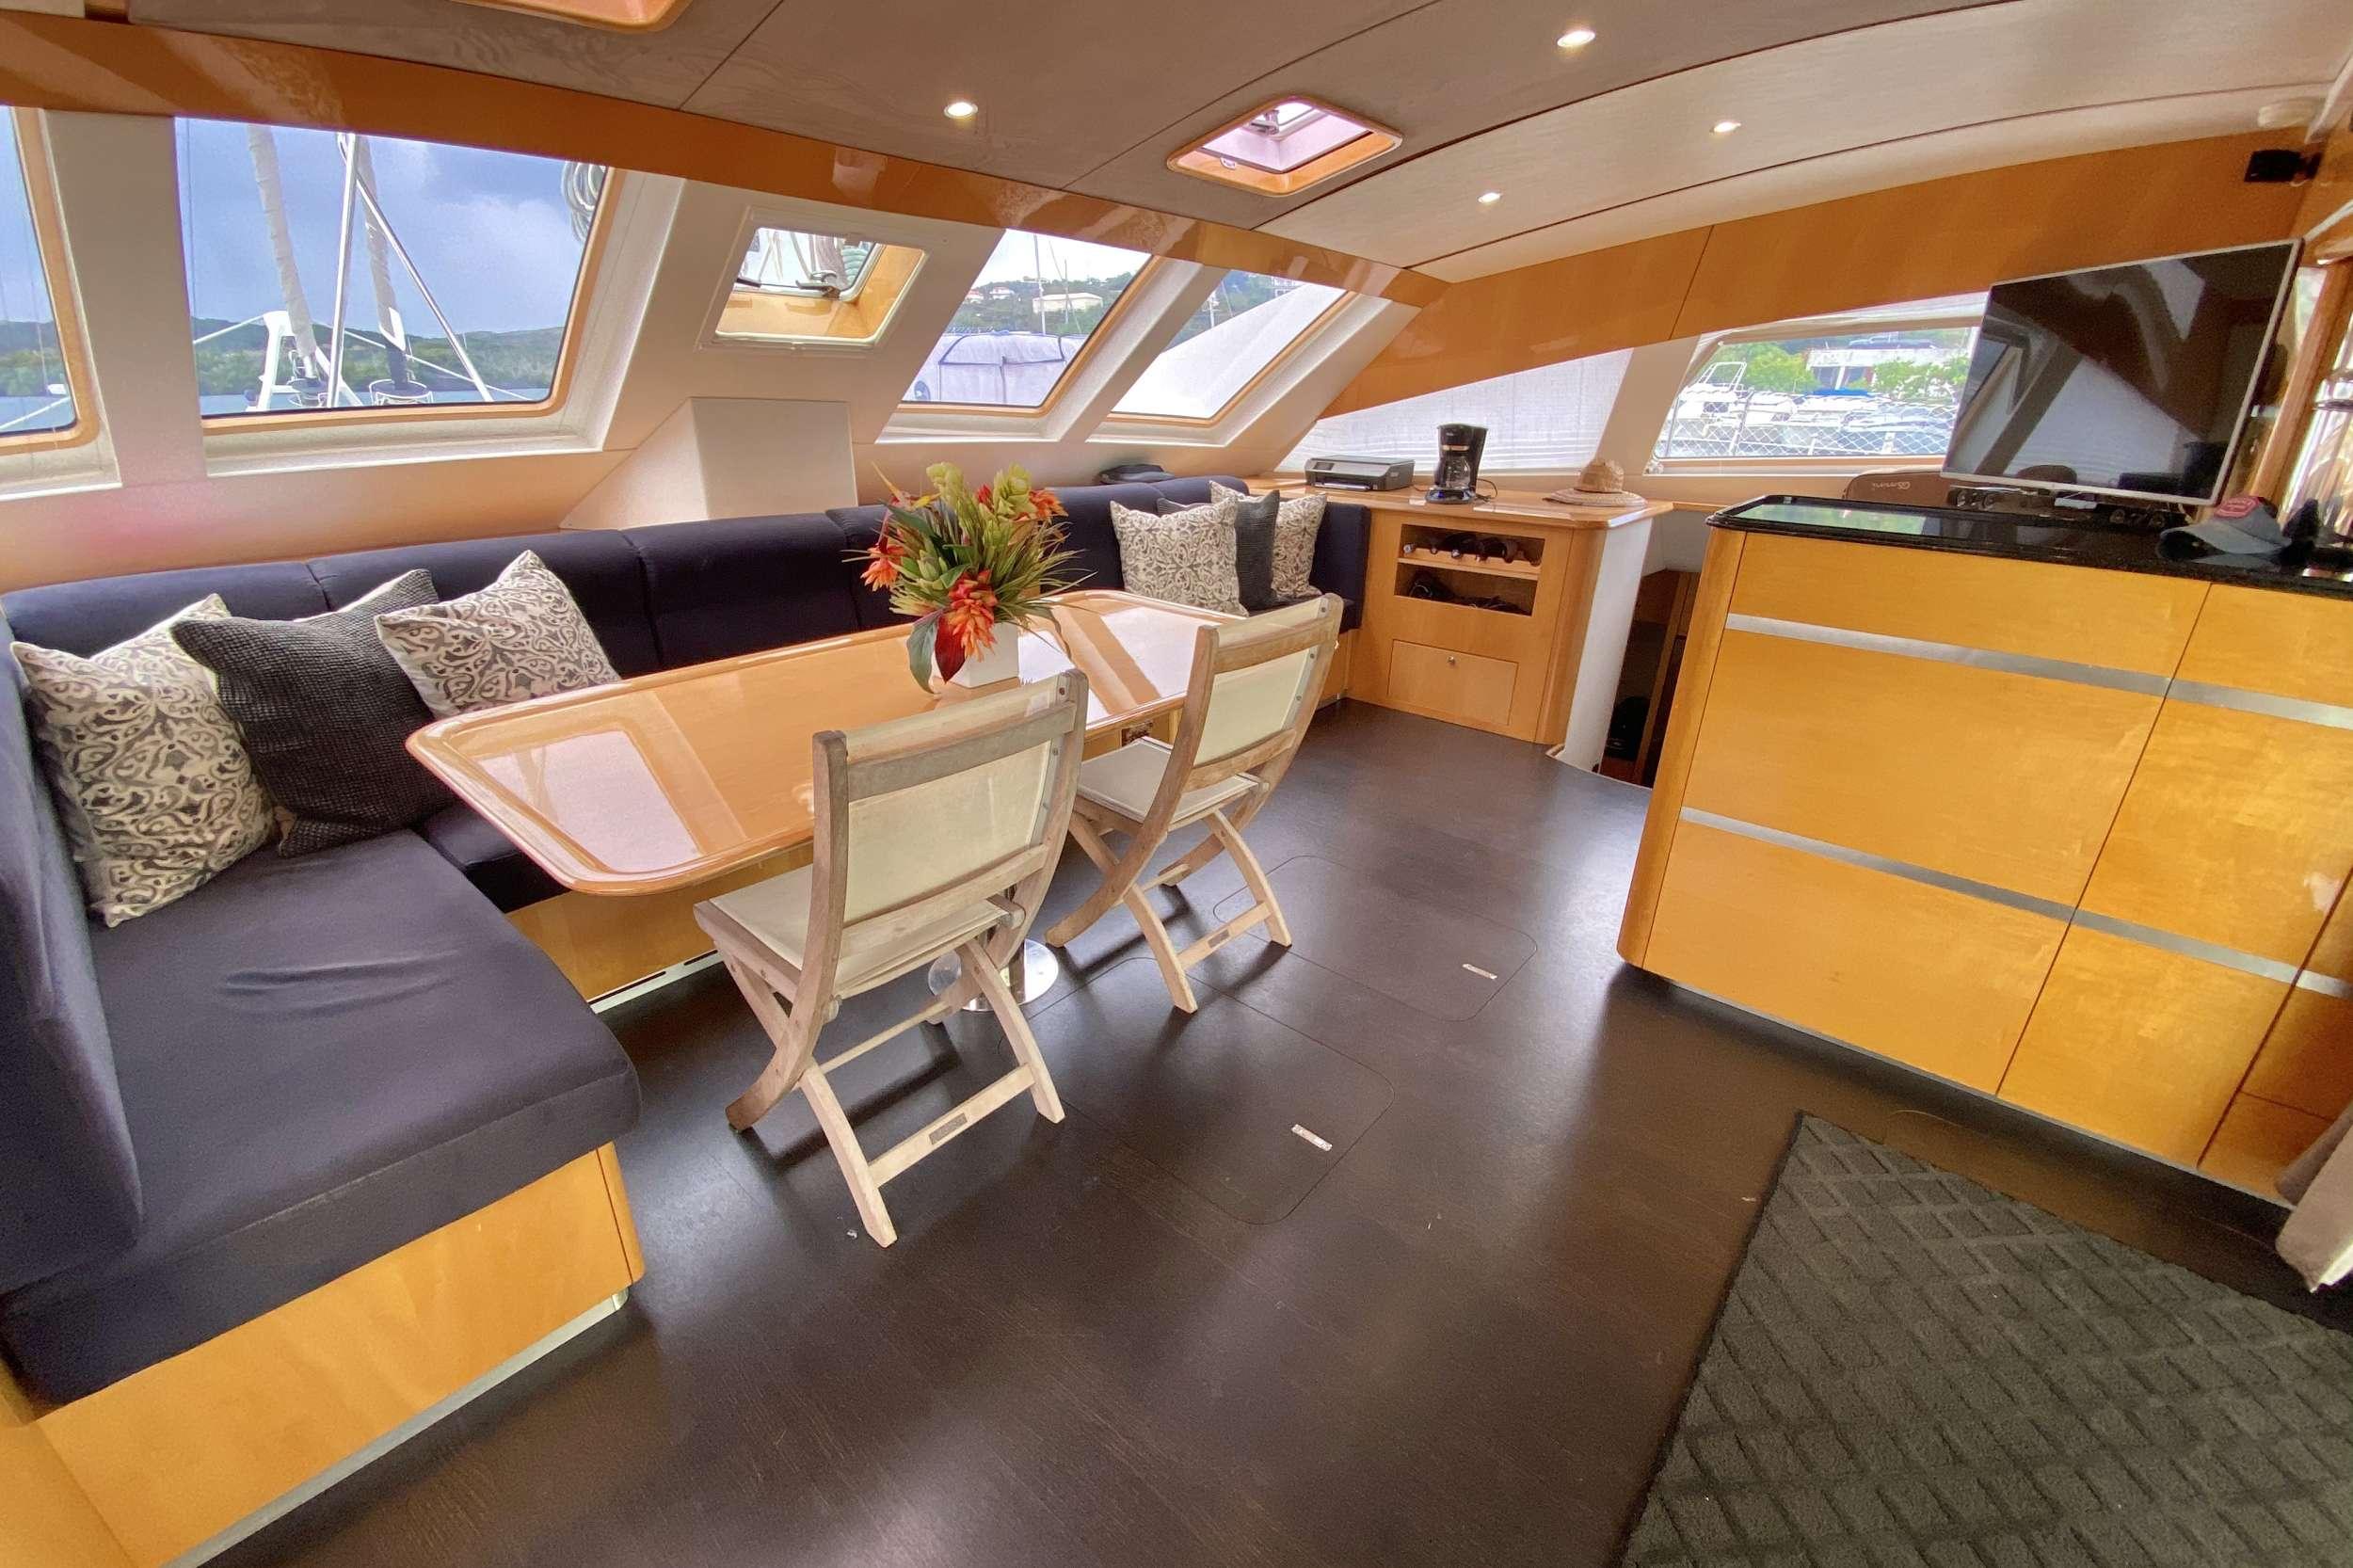 TRES SUENOS yacht image # 9